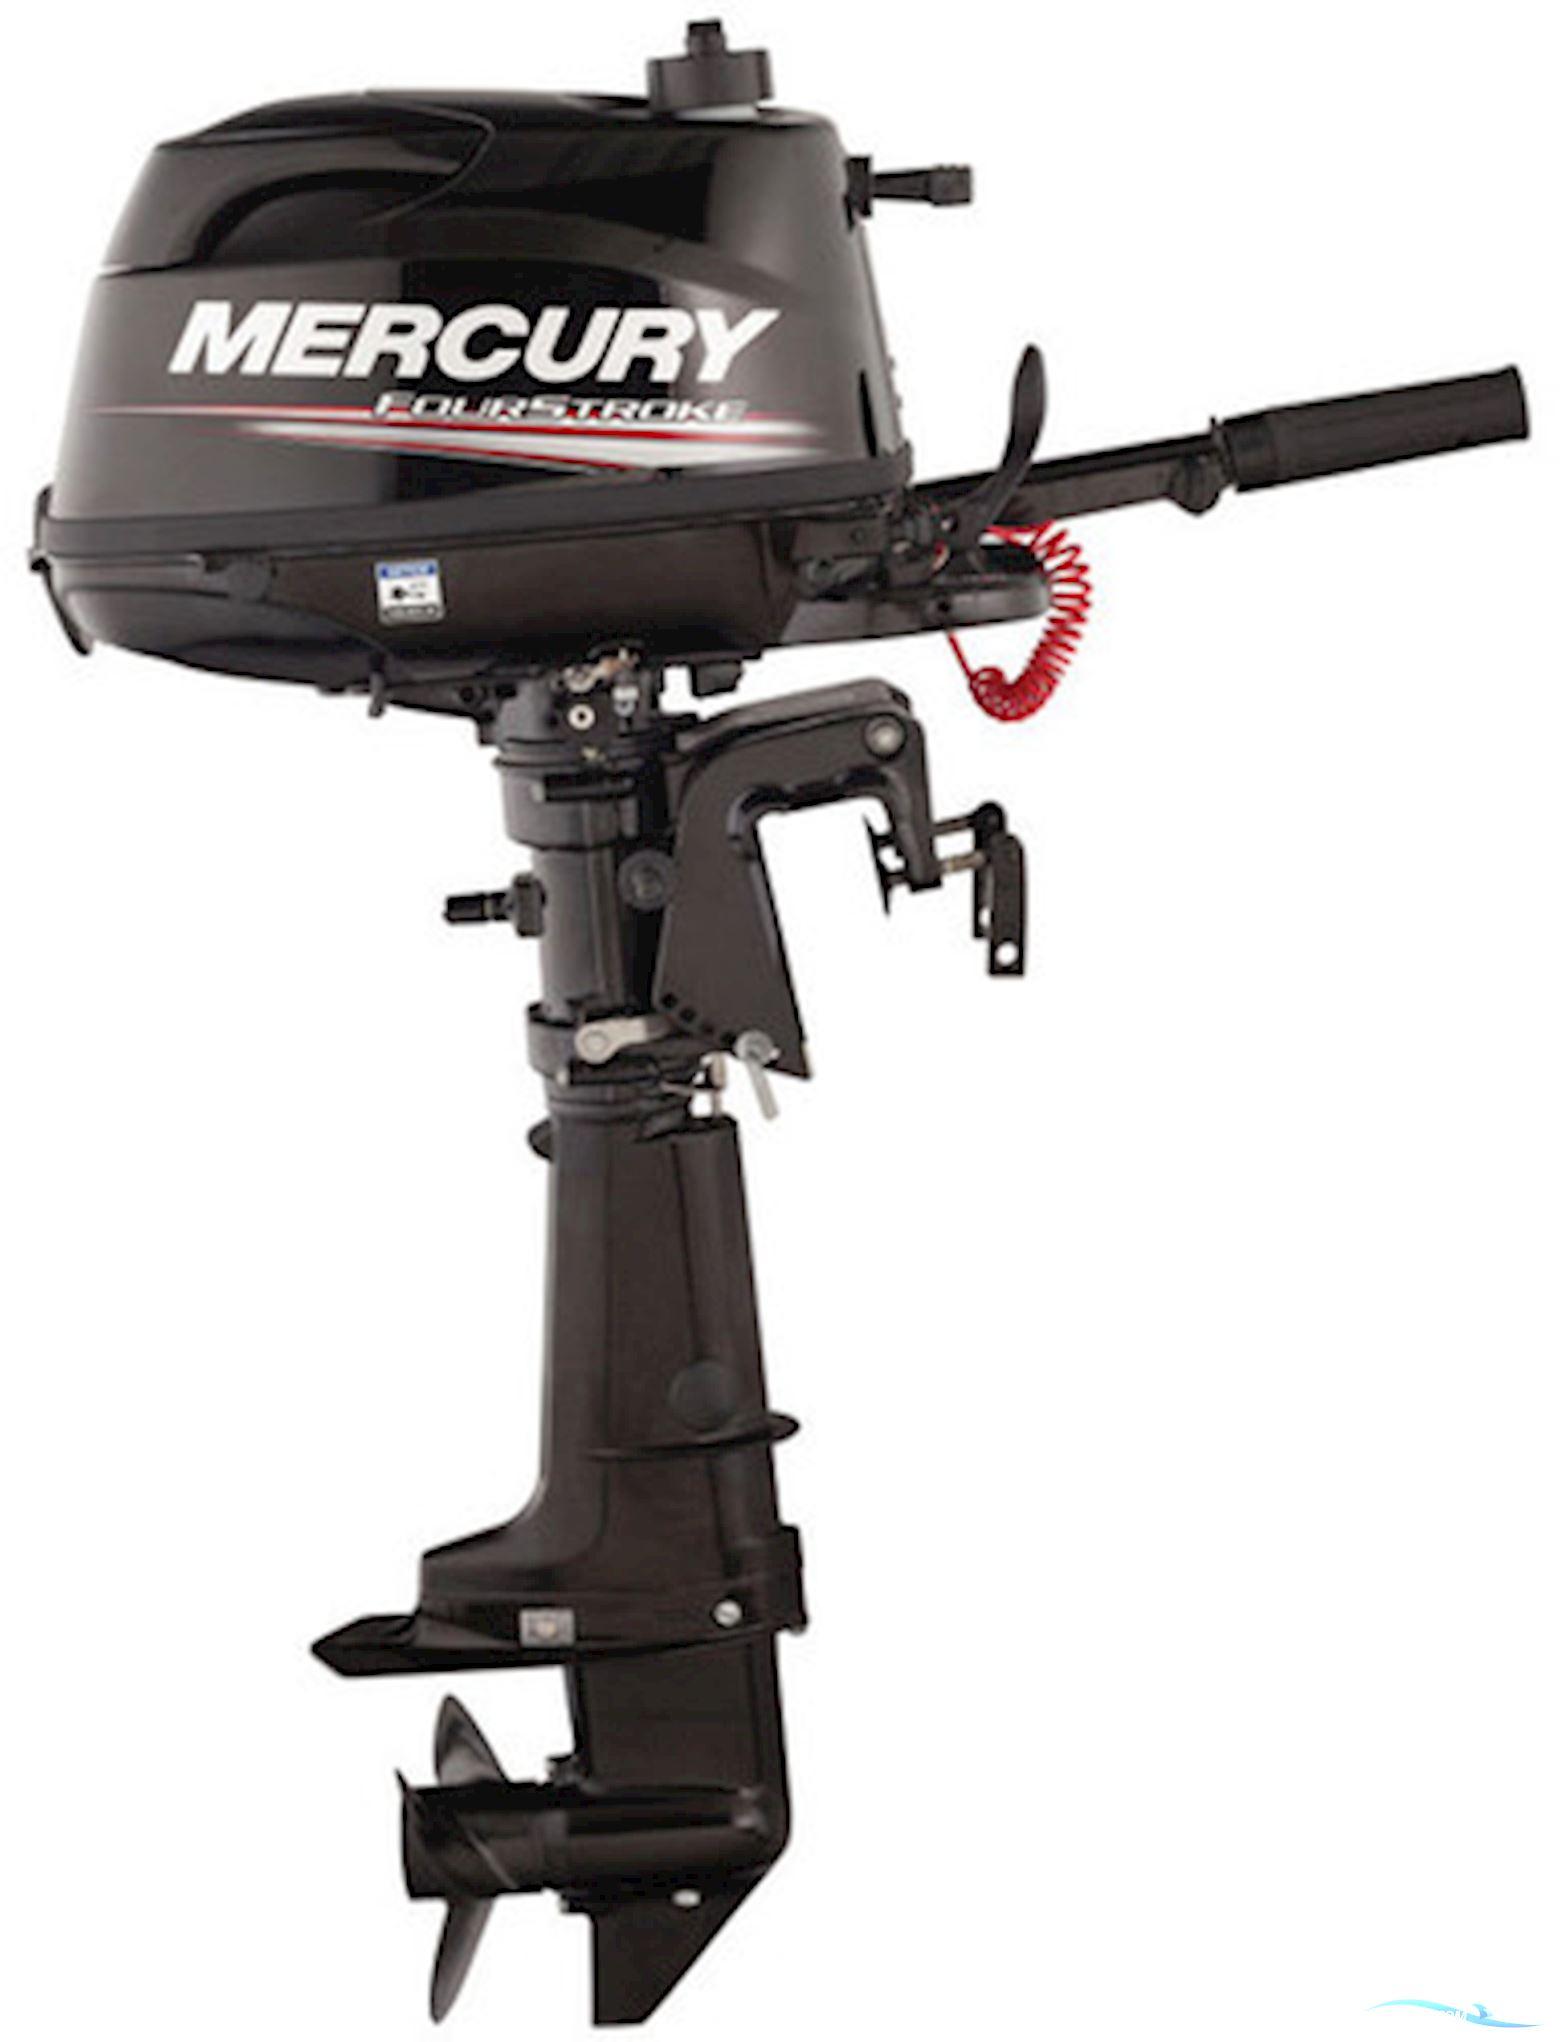 Mercury 6HK DEMO